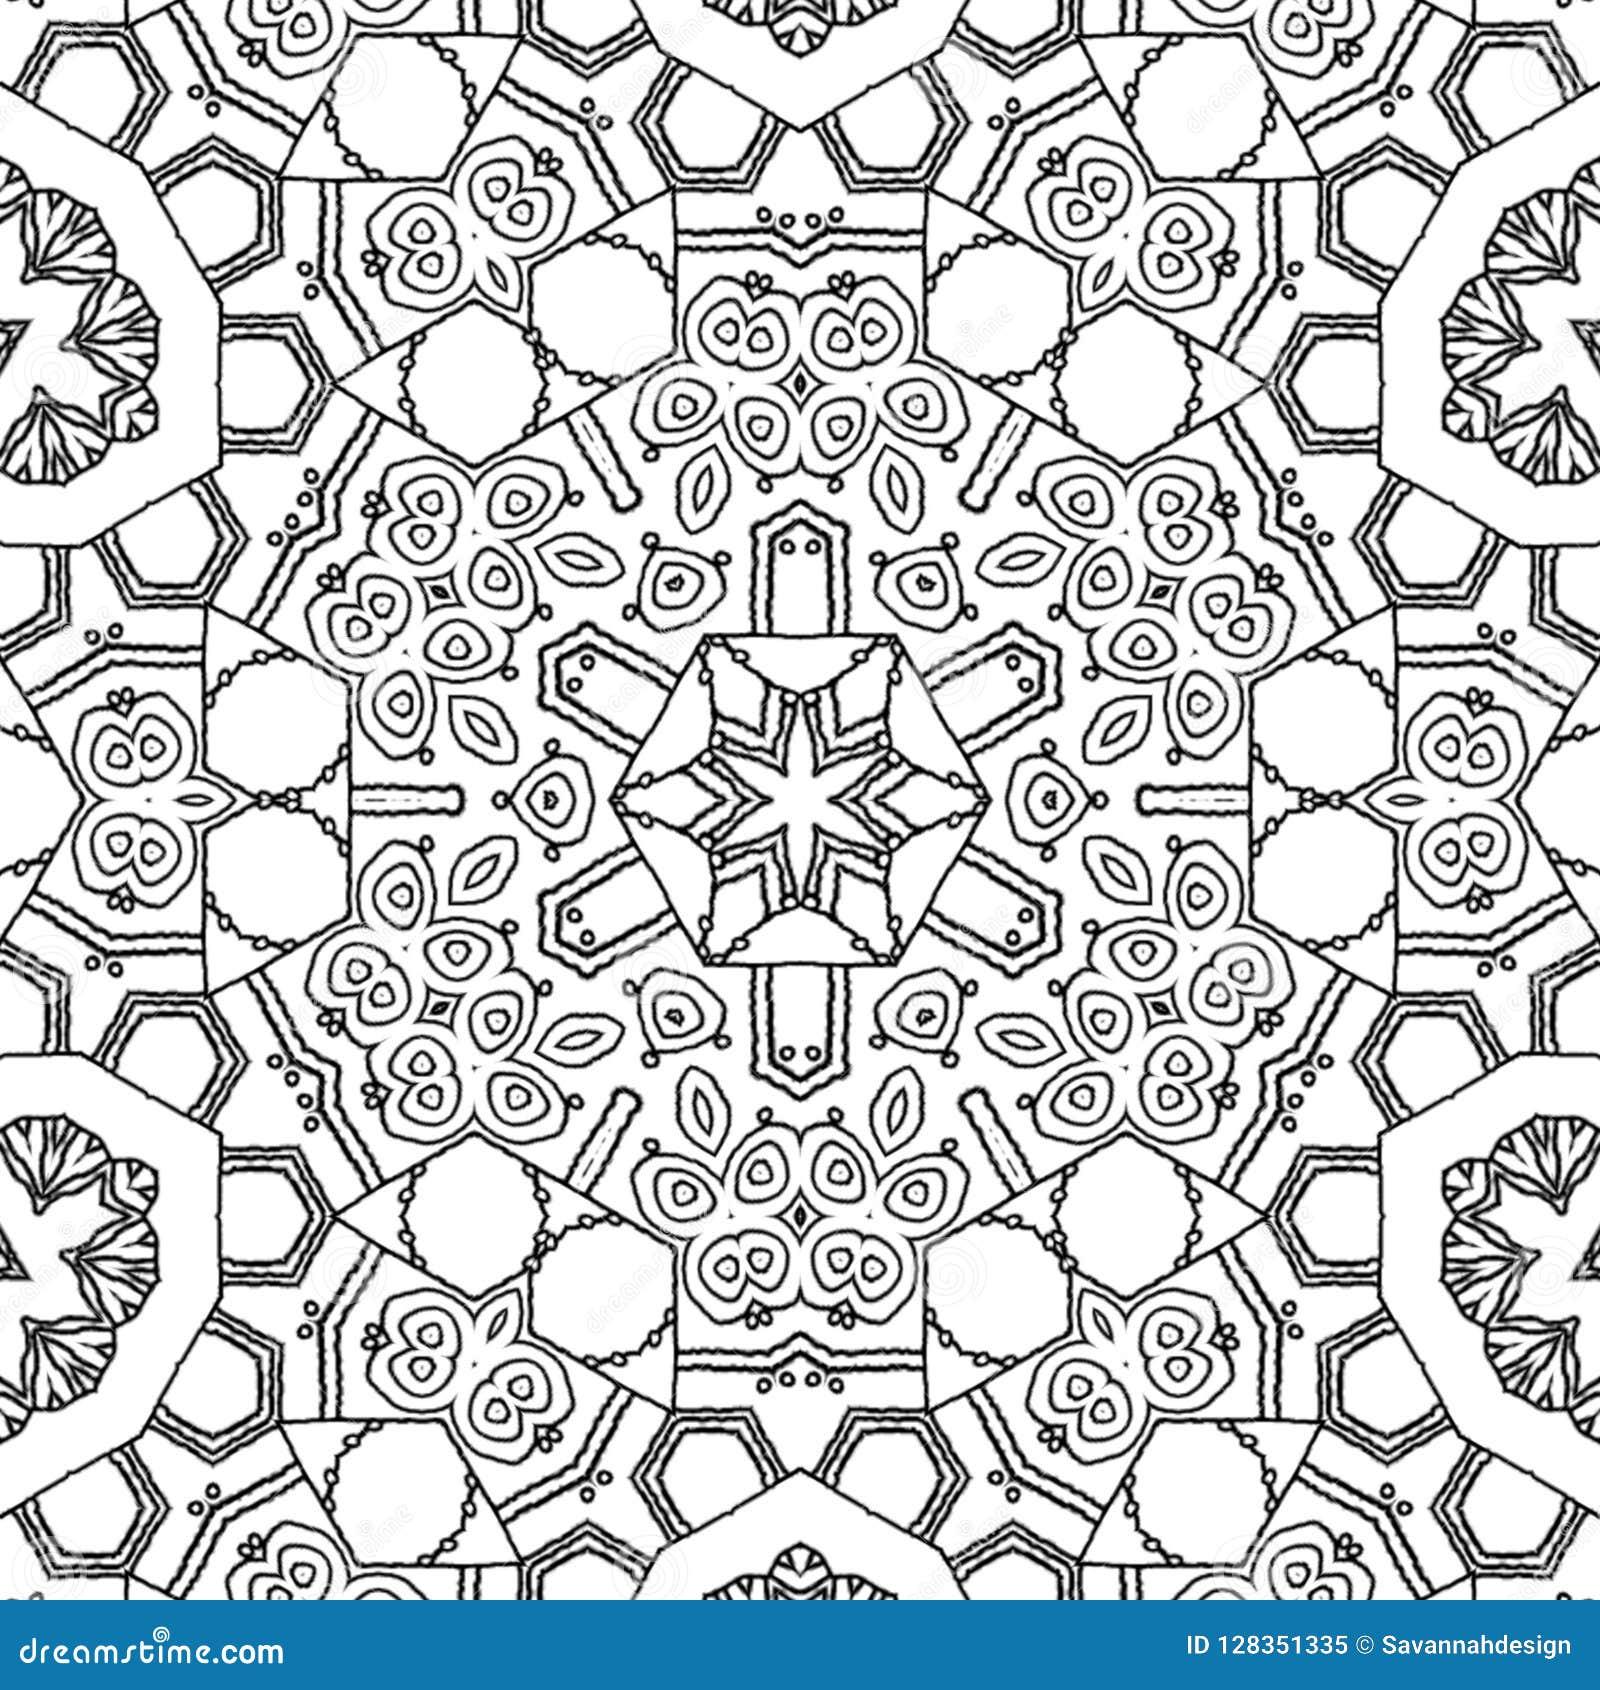 Coloring Page Mandala Star Ornament Stock Illustration